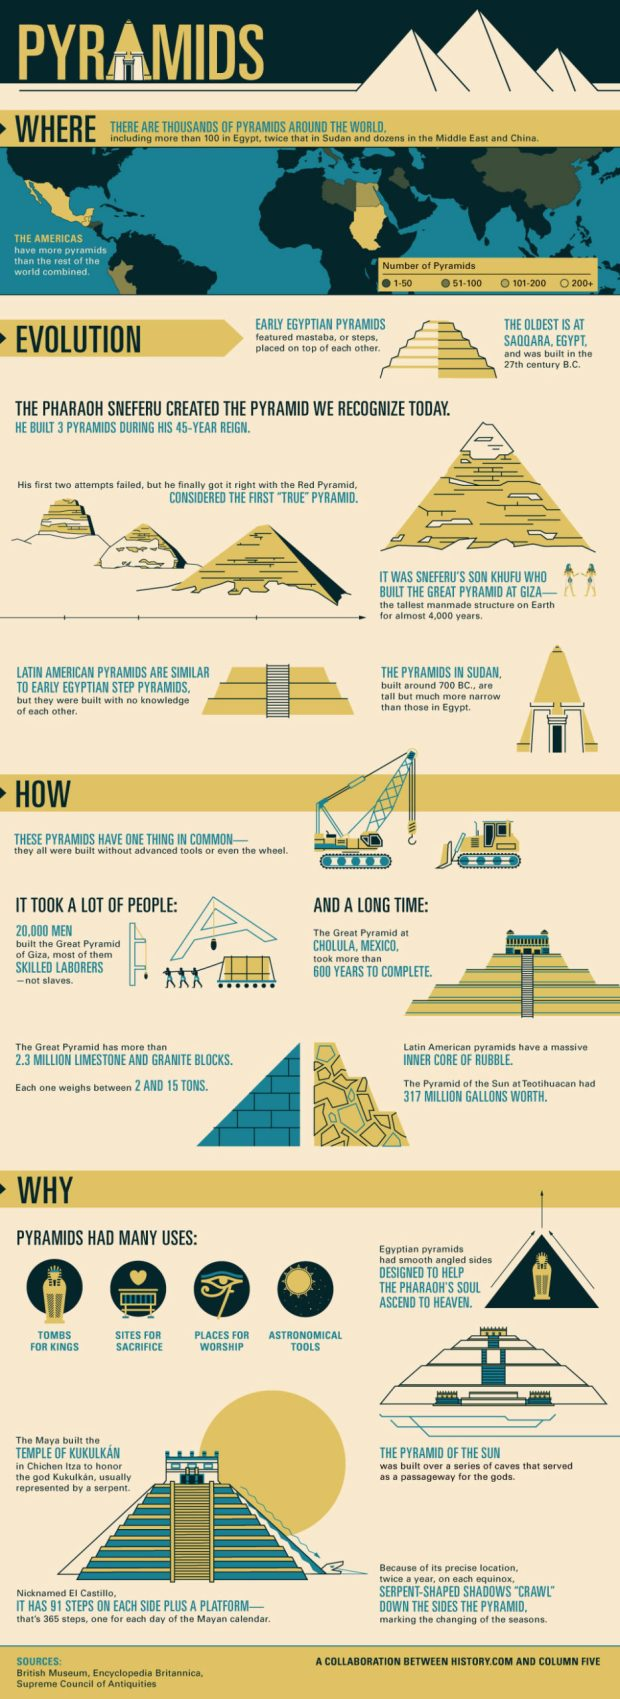 History Of Pyramids